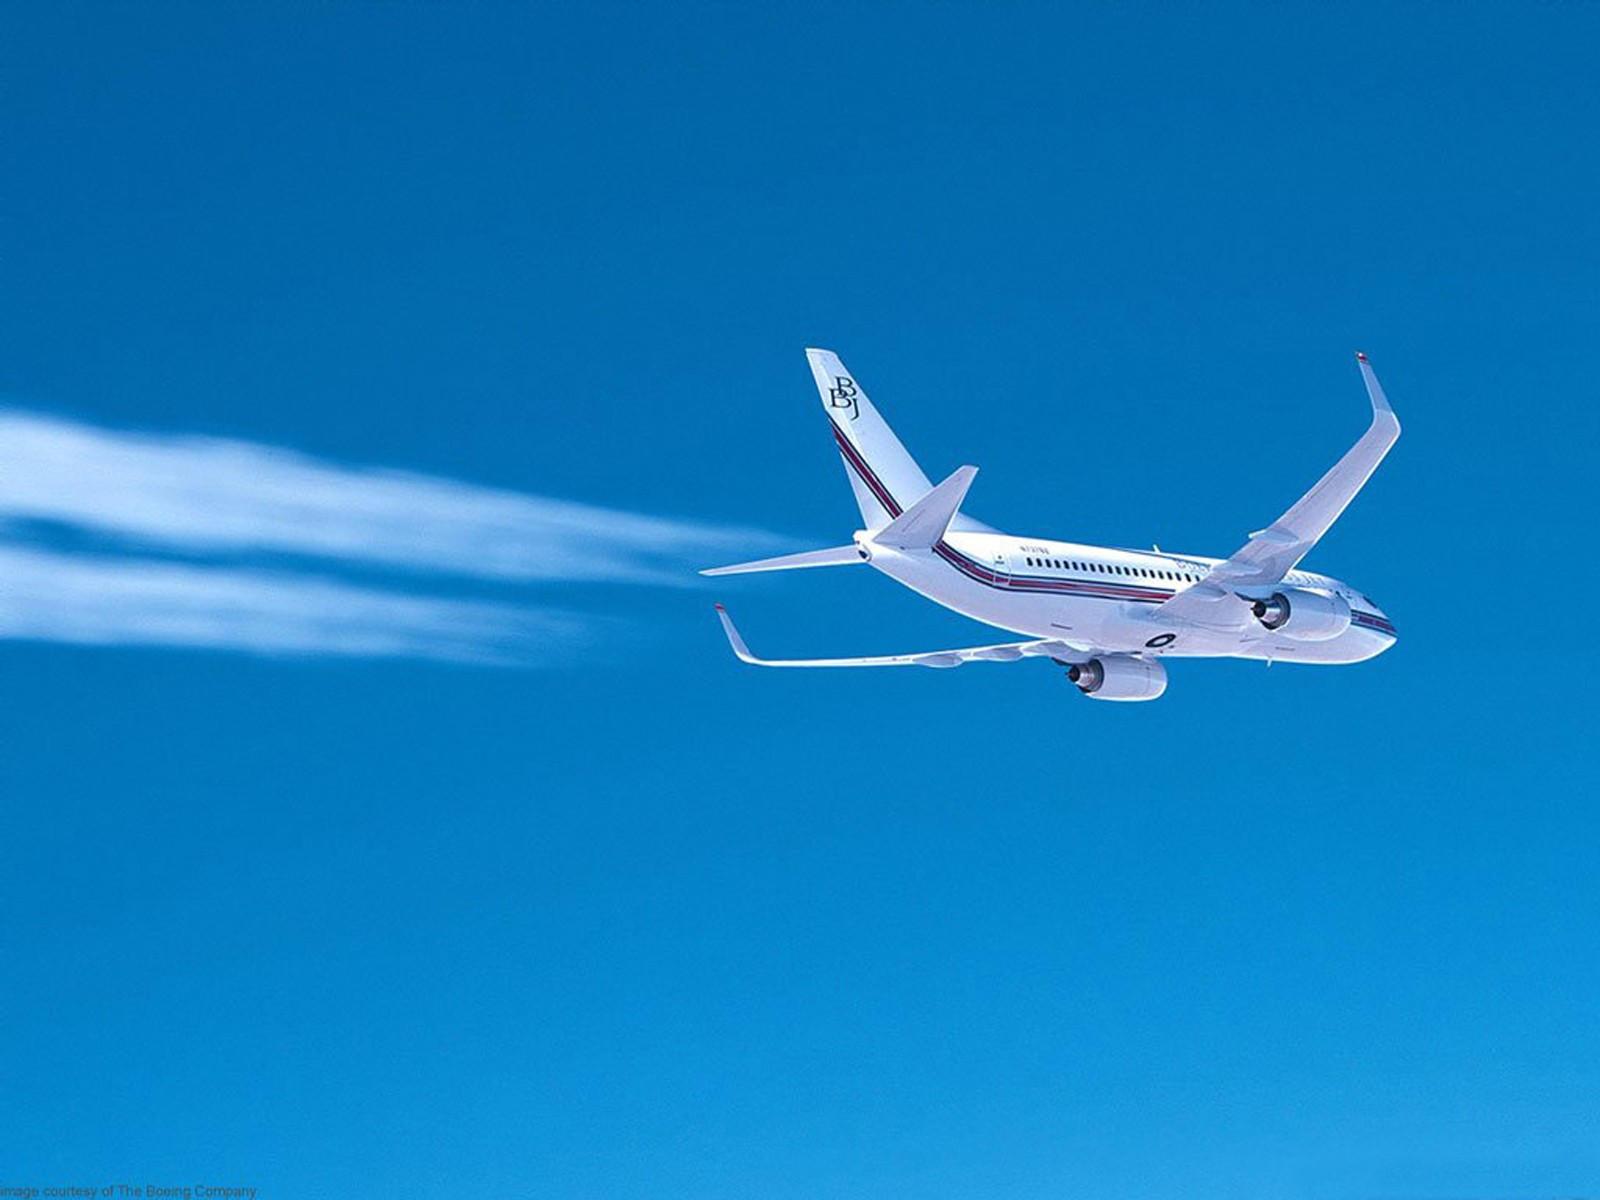 Самолёт летит на фоне синего неба оставляя след